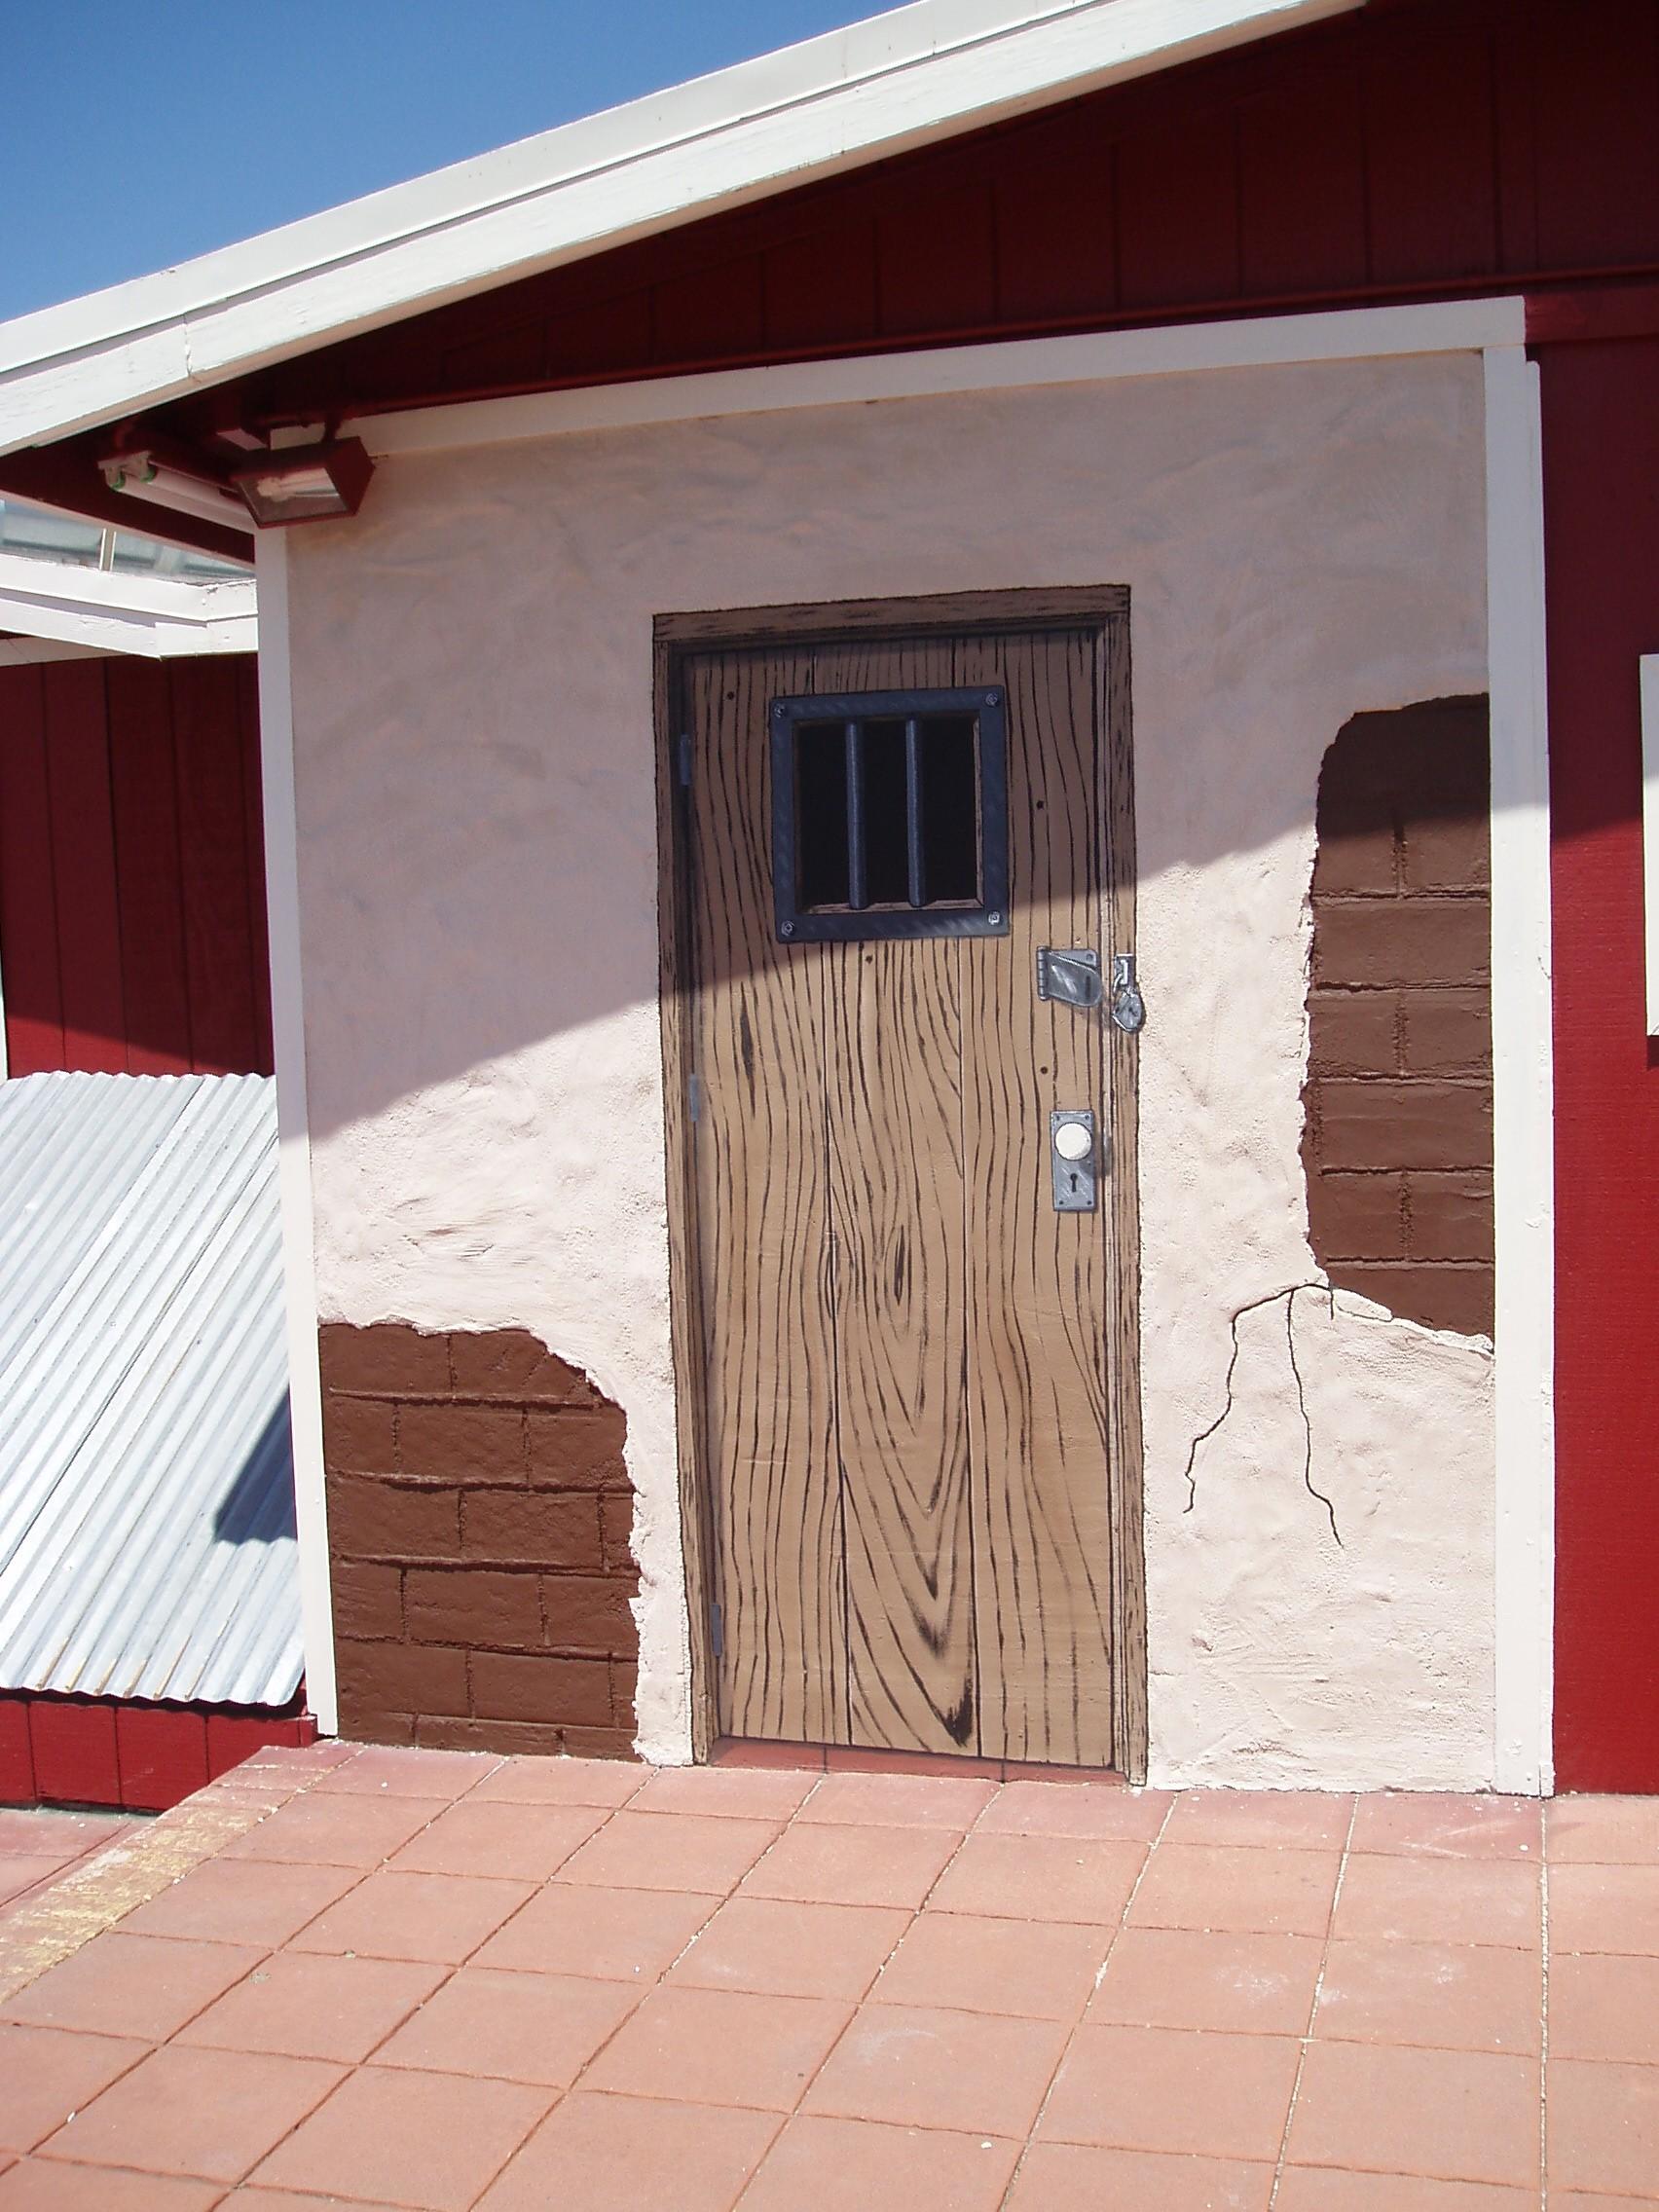 Western Mural Wagon Wheel Restaurant exterior Santee California 12.JPG